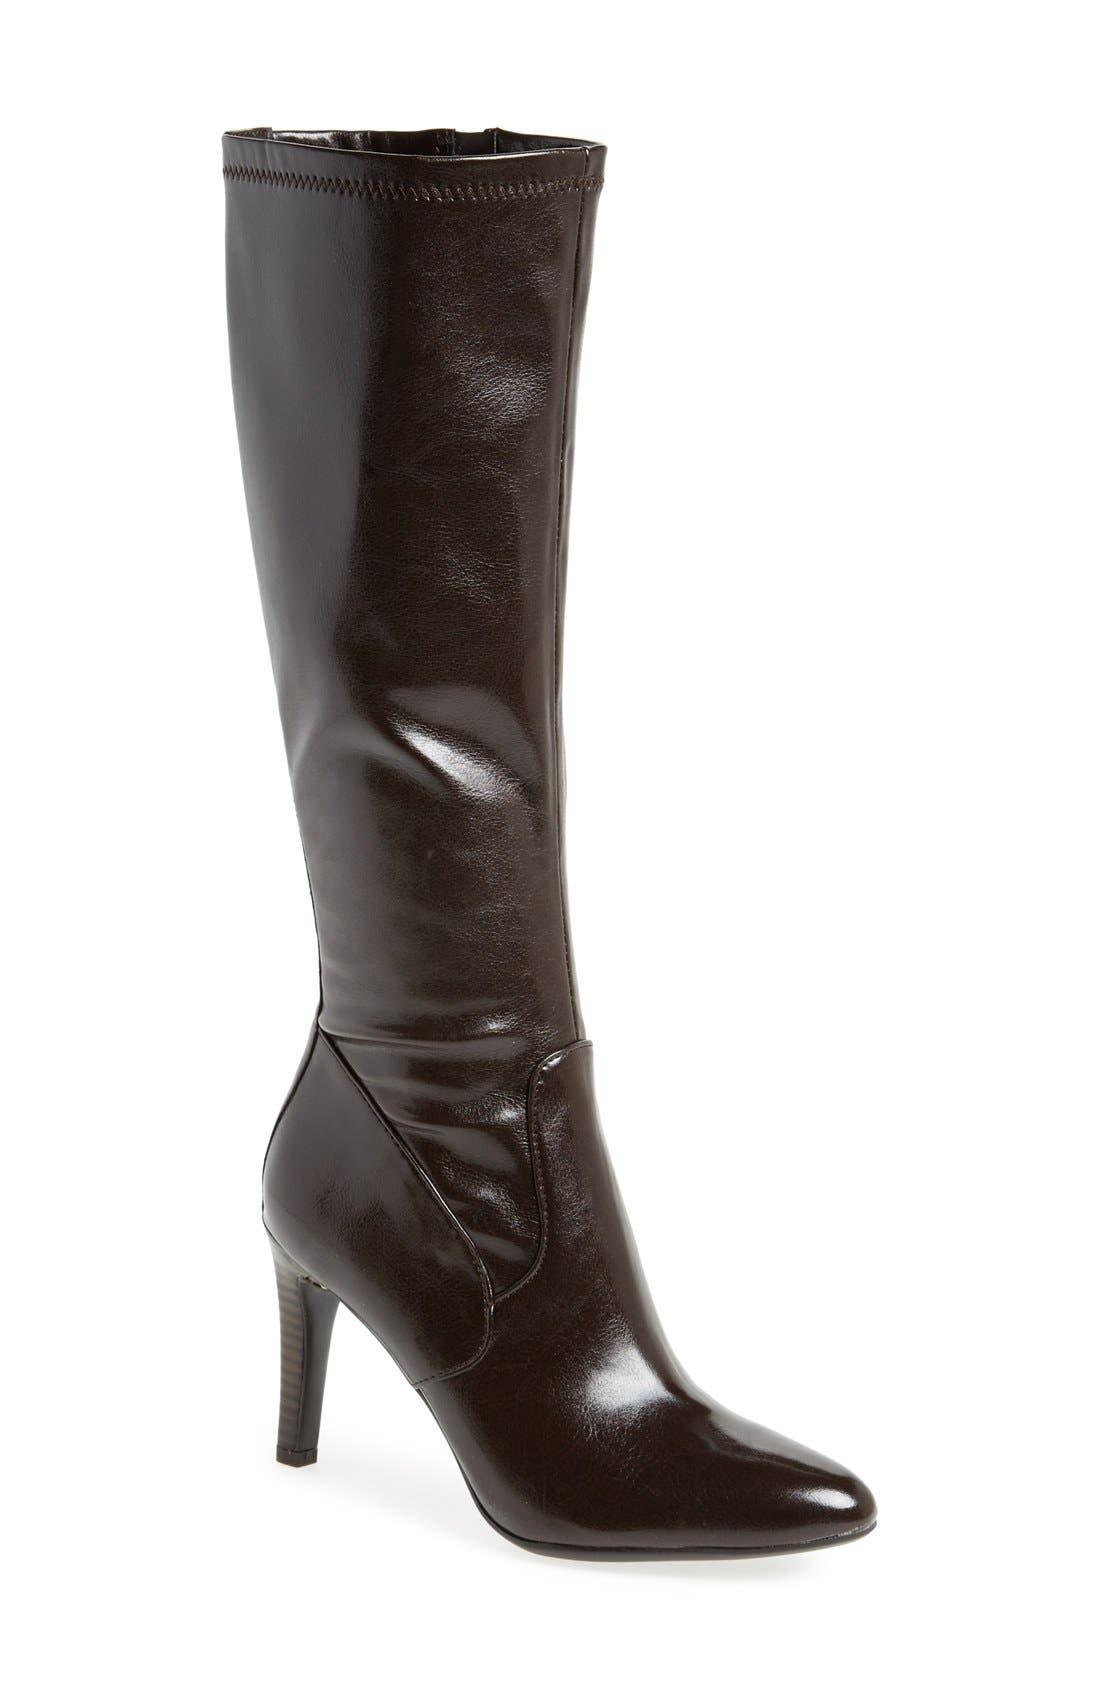 Alternate Image 1 Selected - Franco Sarto 'Coralla' Tall Boot (Women)